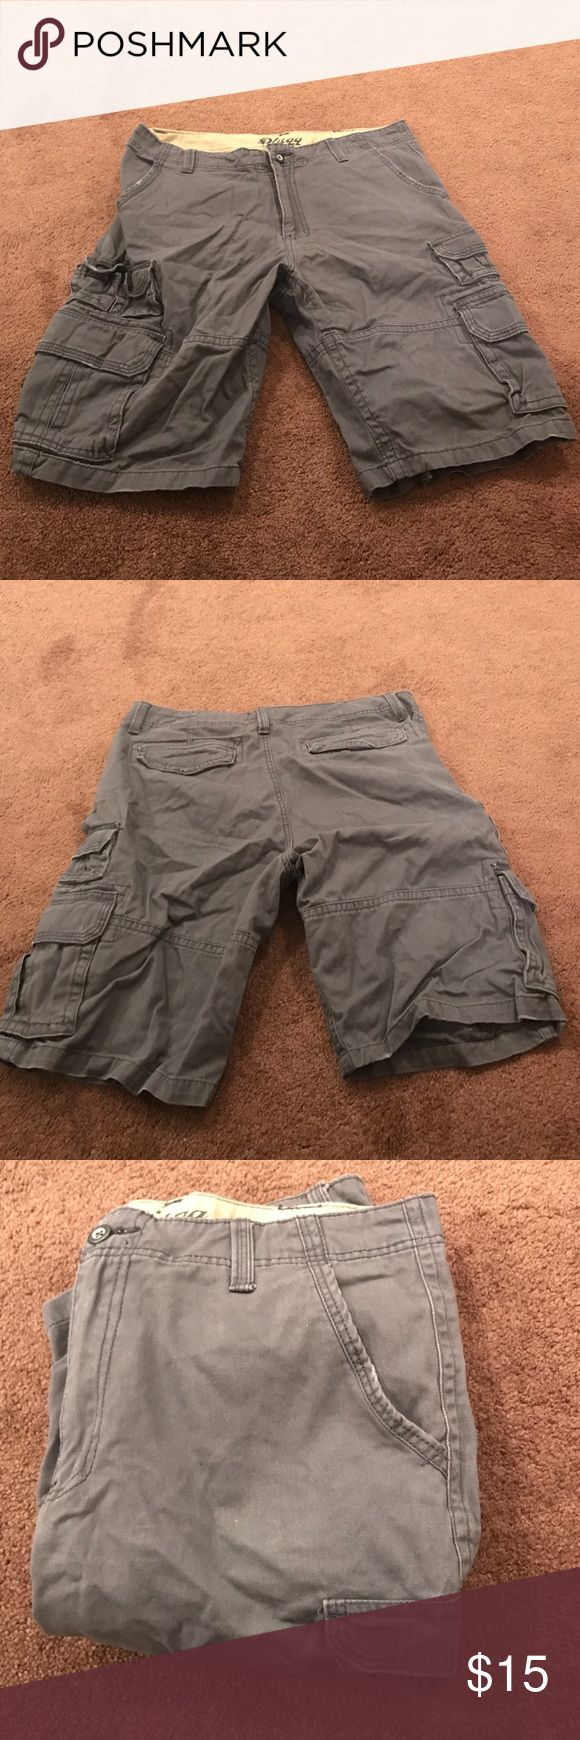 Grey Cargo Shorts for Men Worn once cargo shorts; Size 34 Shorts